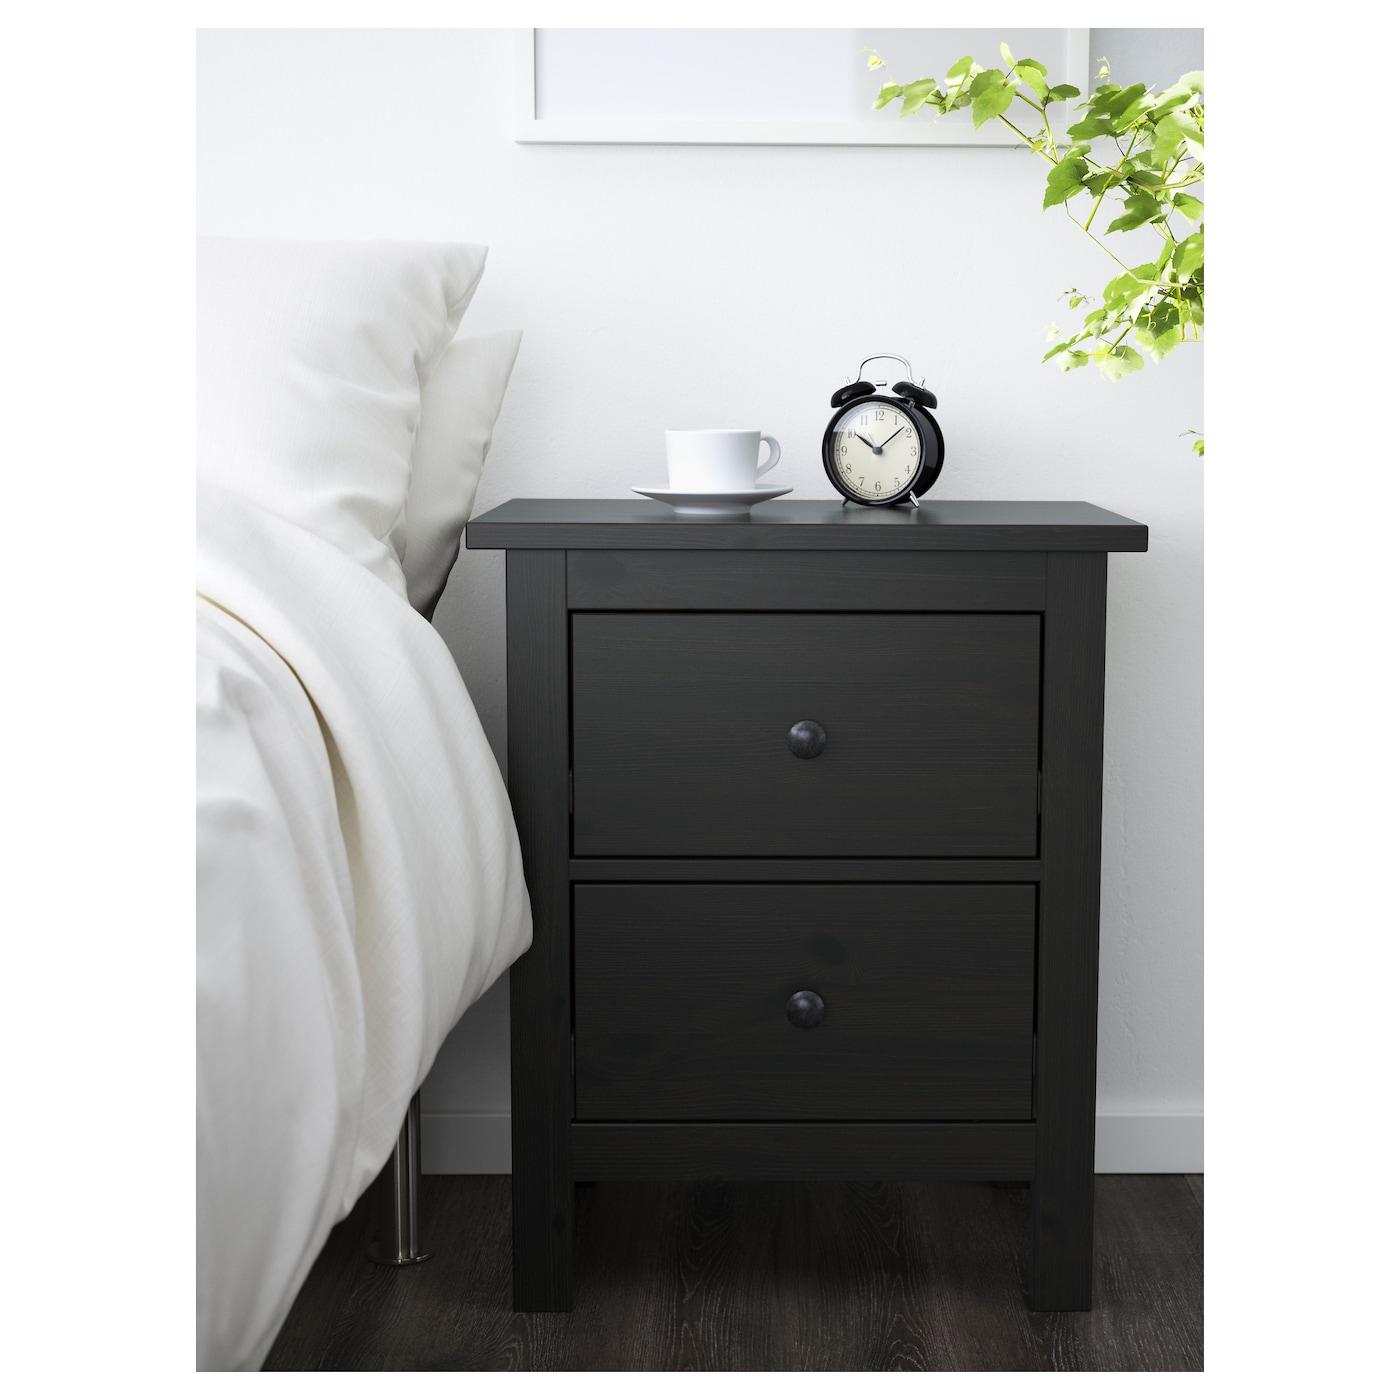 white 21 1//4x26 HEMNES 2-drawer chest